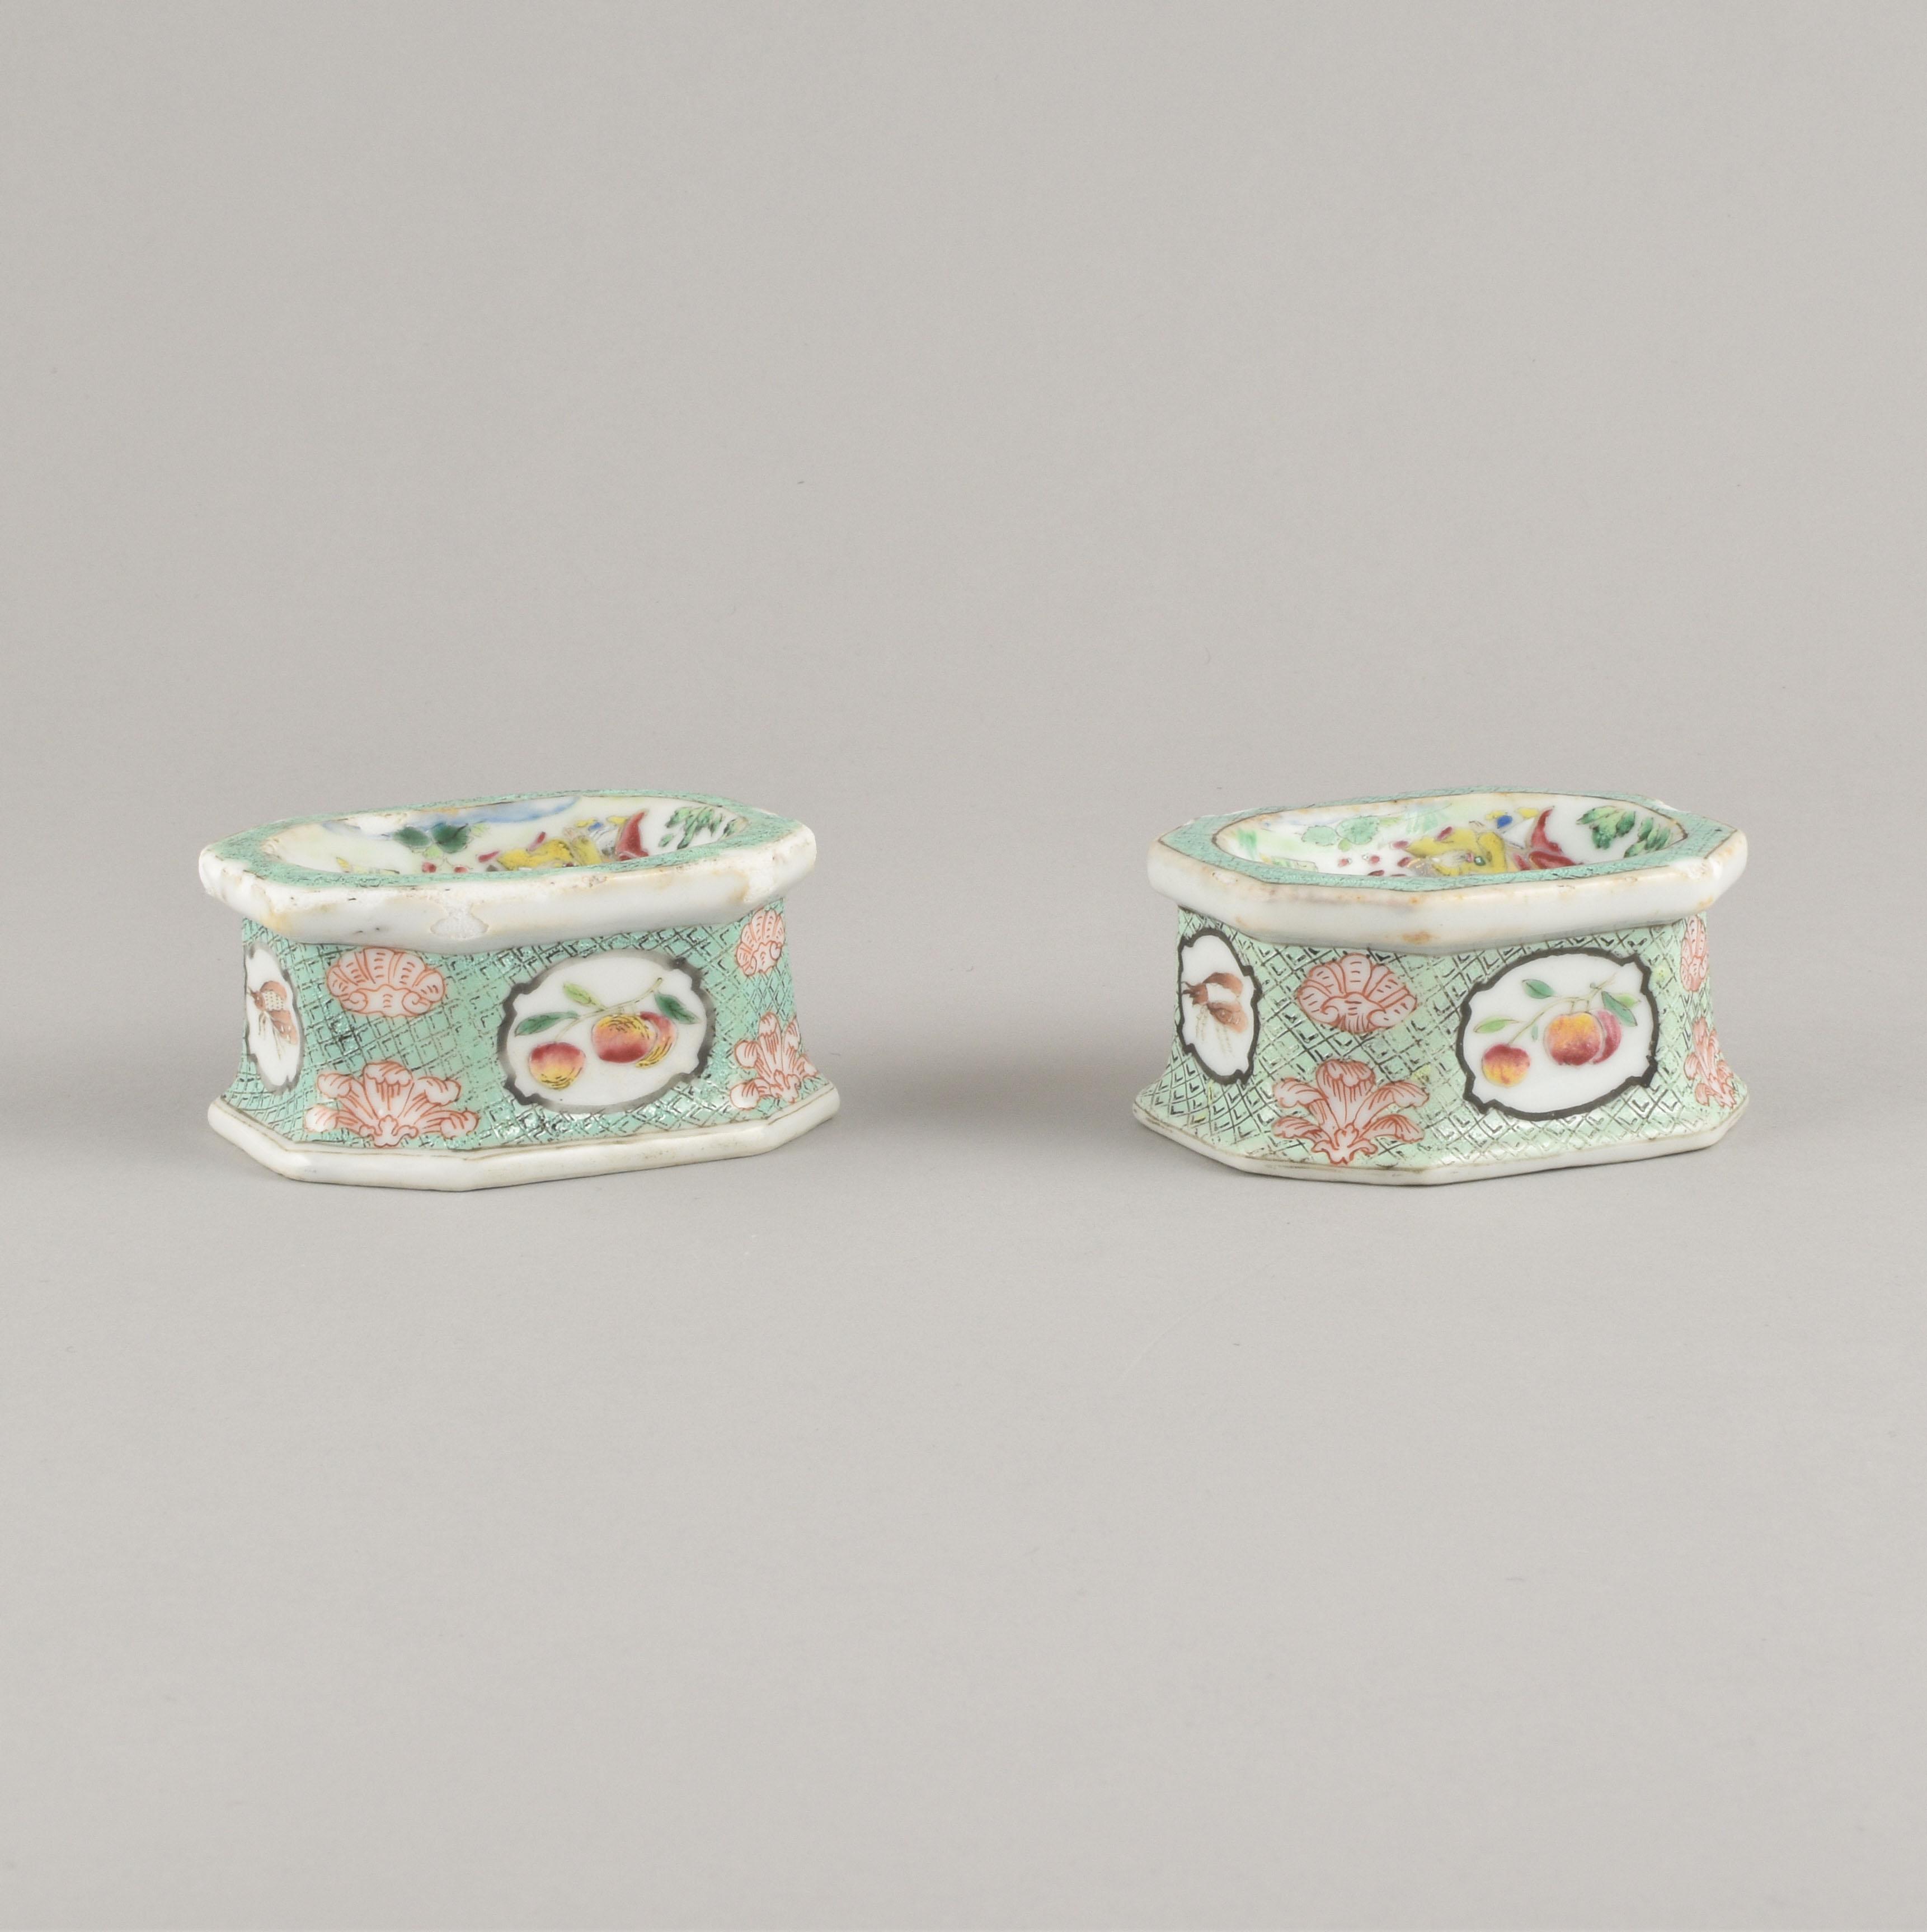 Porcelaine Qianlong period (1736-1795), circa 1738/1740, Chine